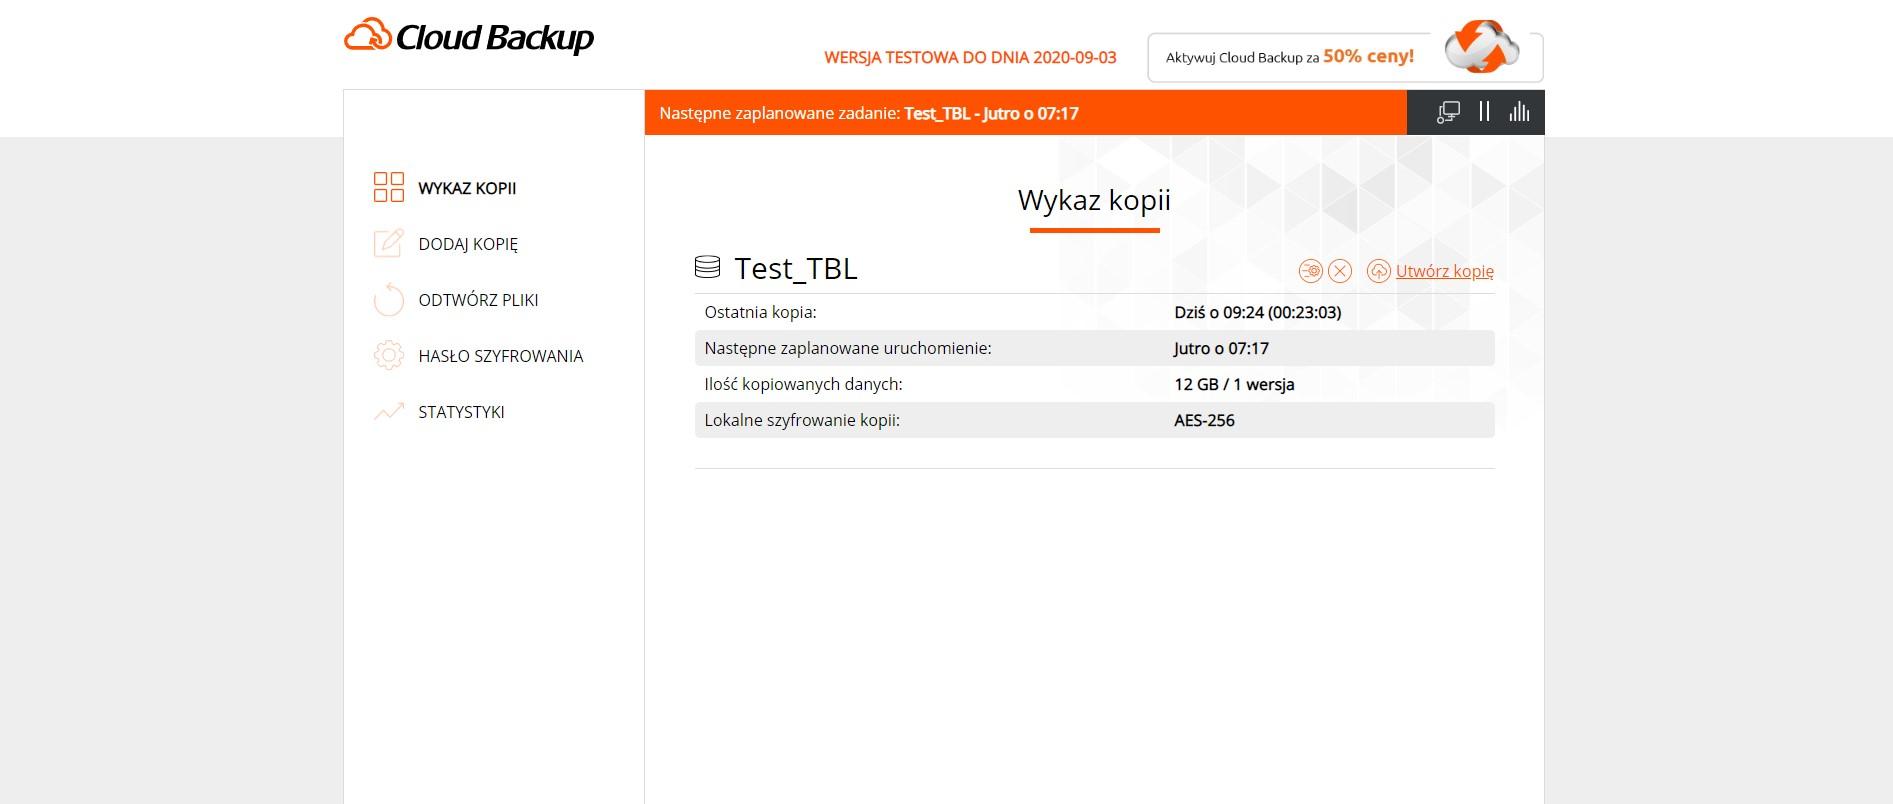 Cloud Backup w Nazwa.pl